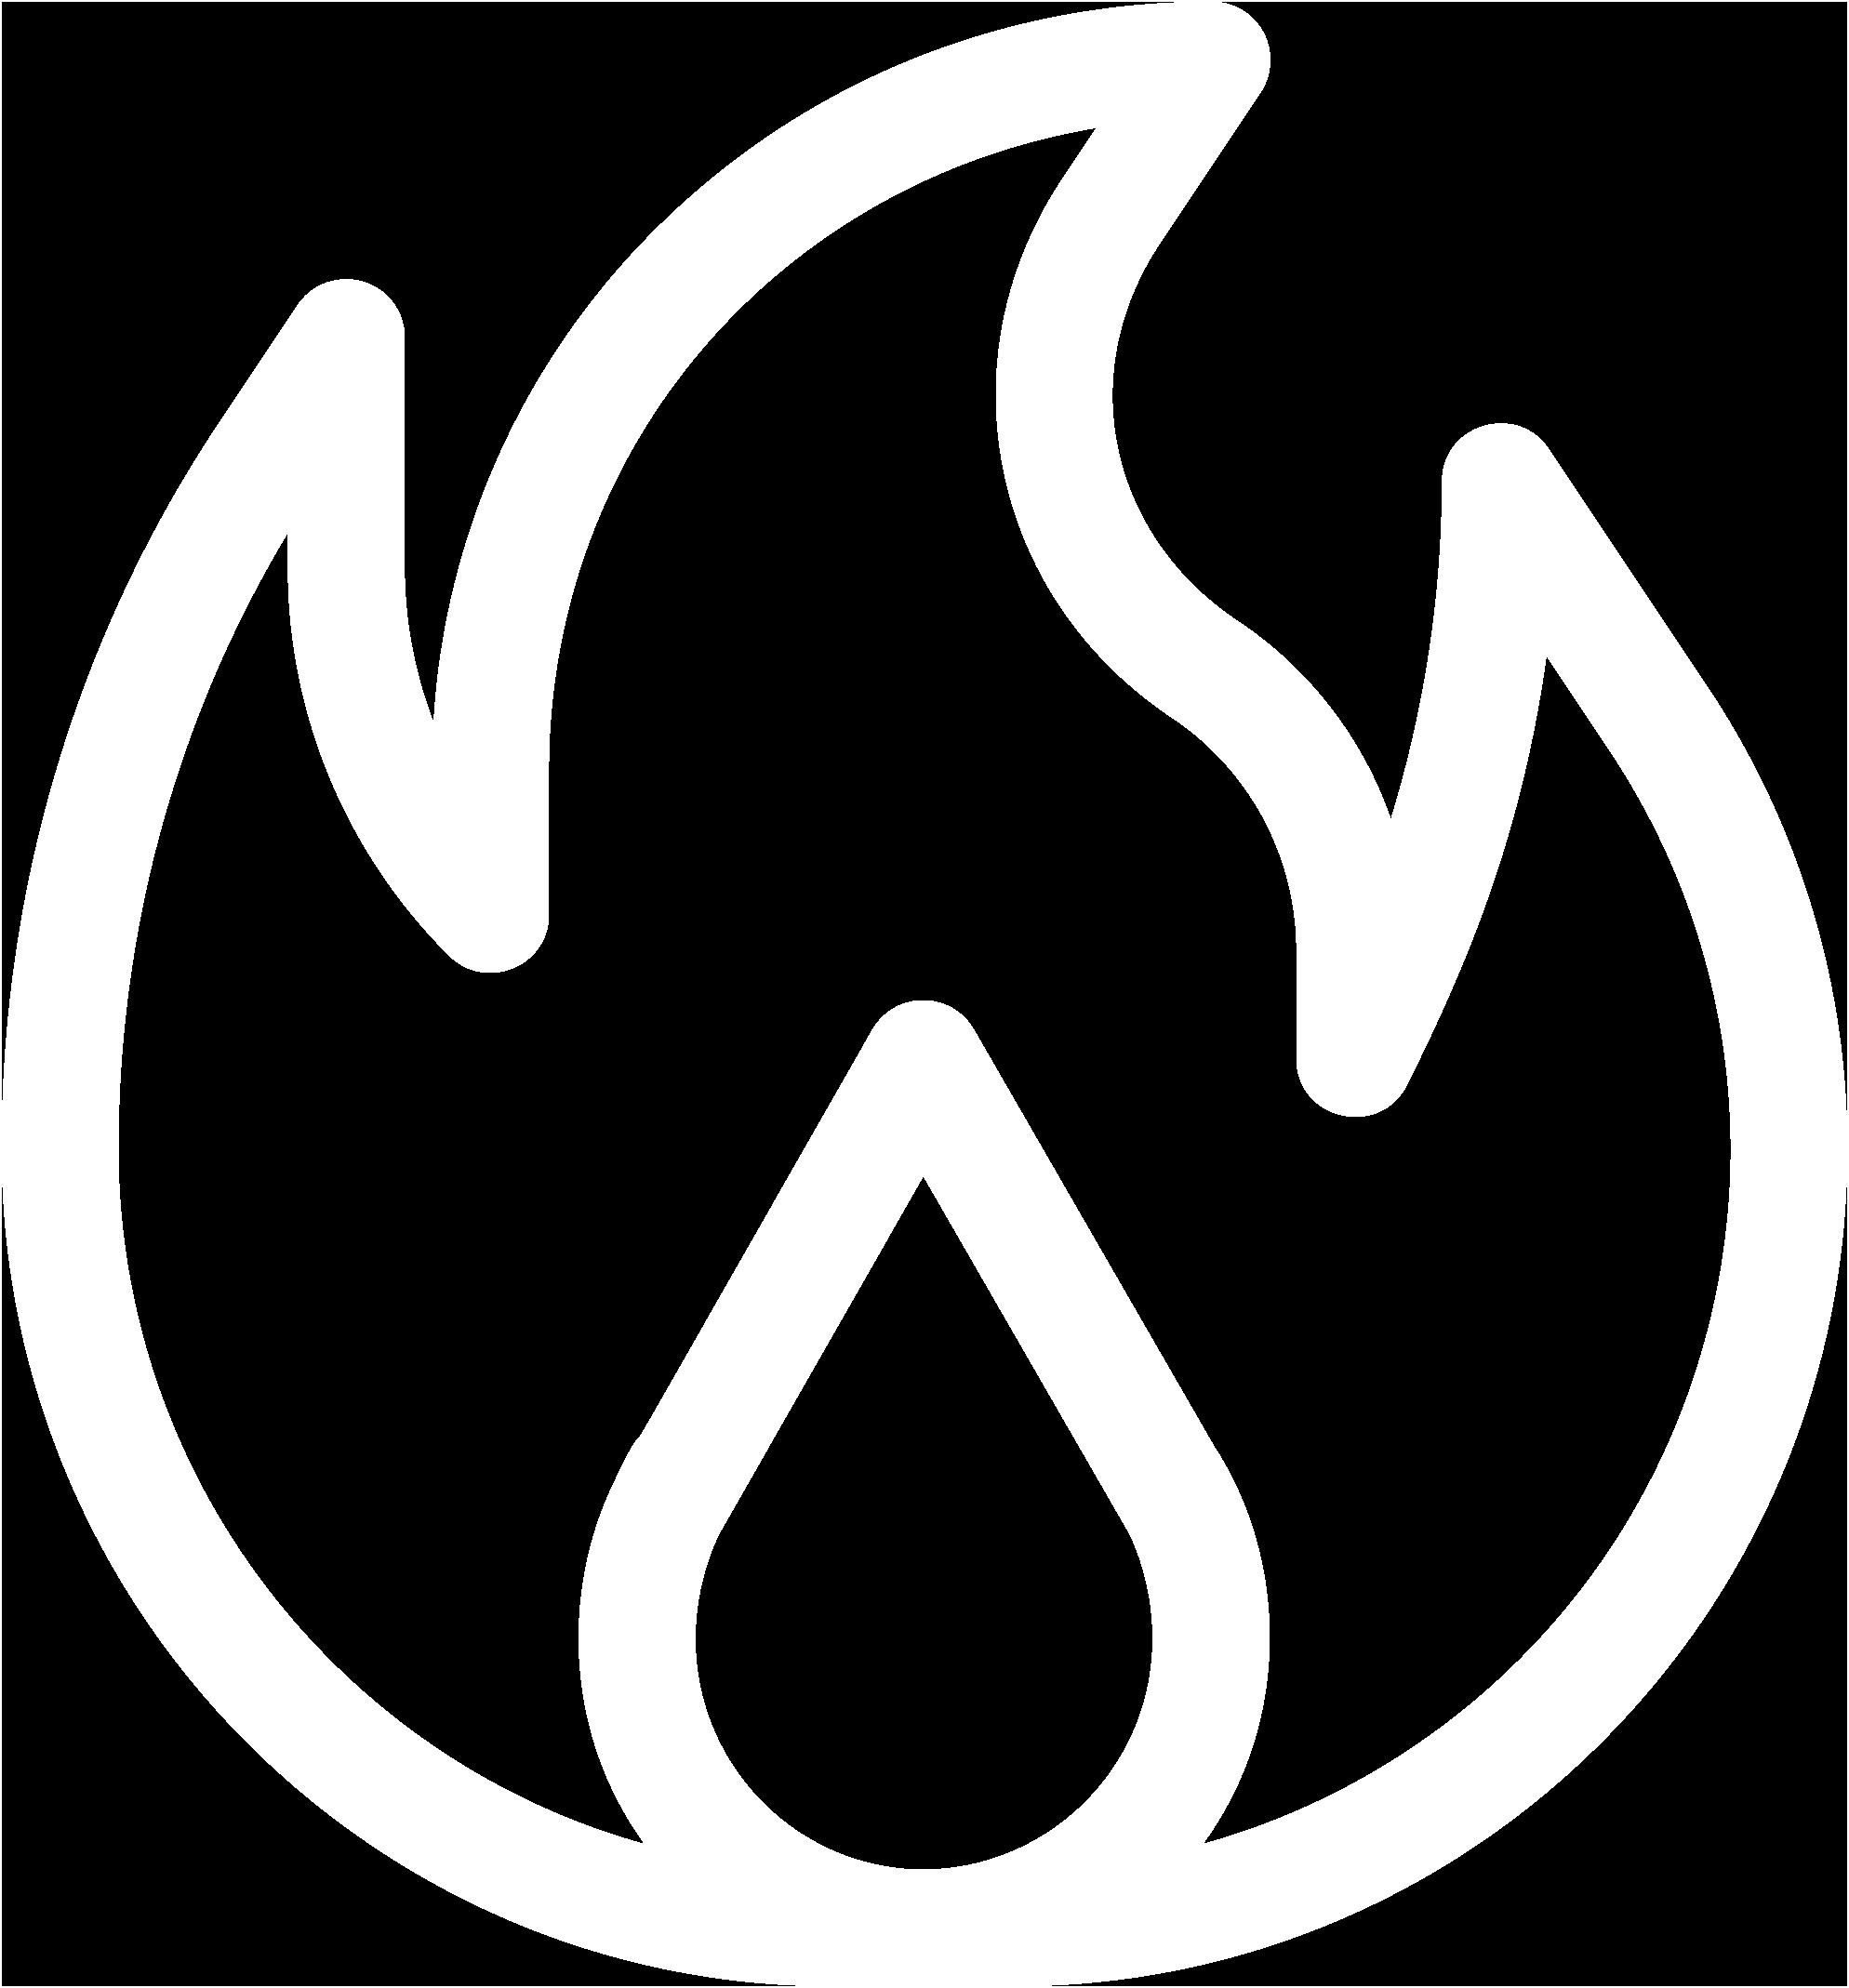 Frie & Smoke damage